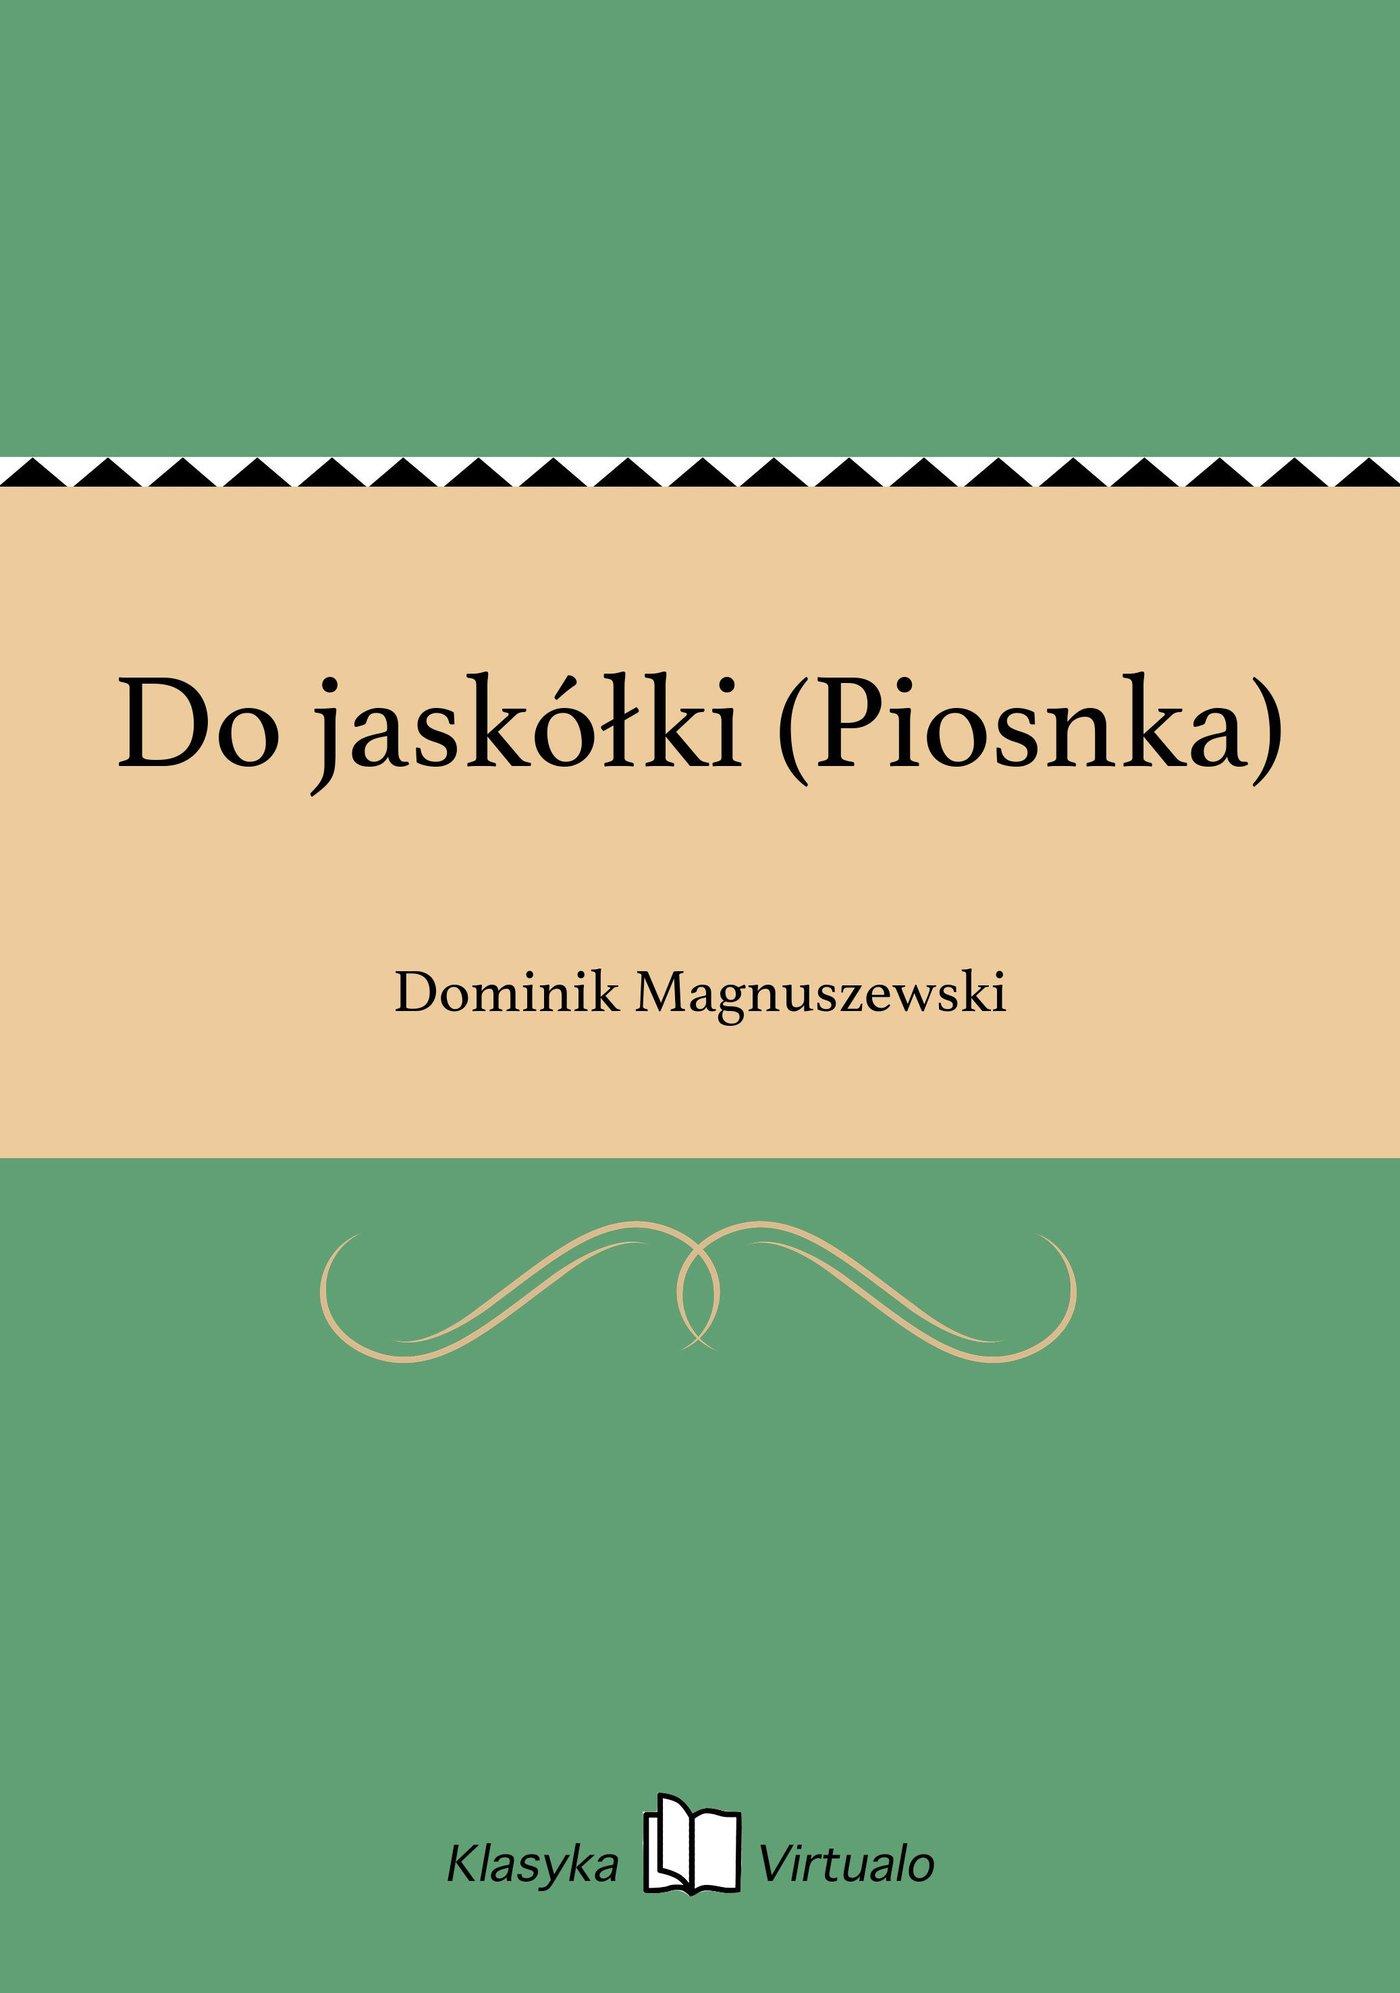 Do jaskółki (Piosnka) - Ebook (Książka EPUB) do pobrania w formacie EPUB